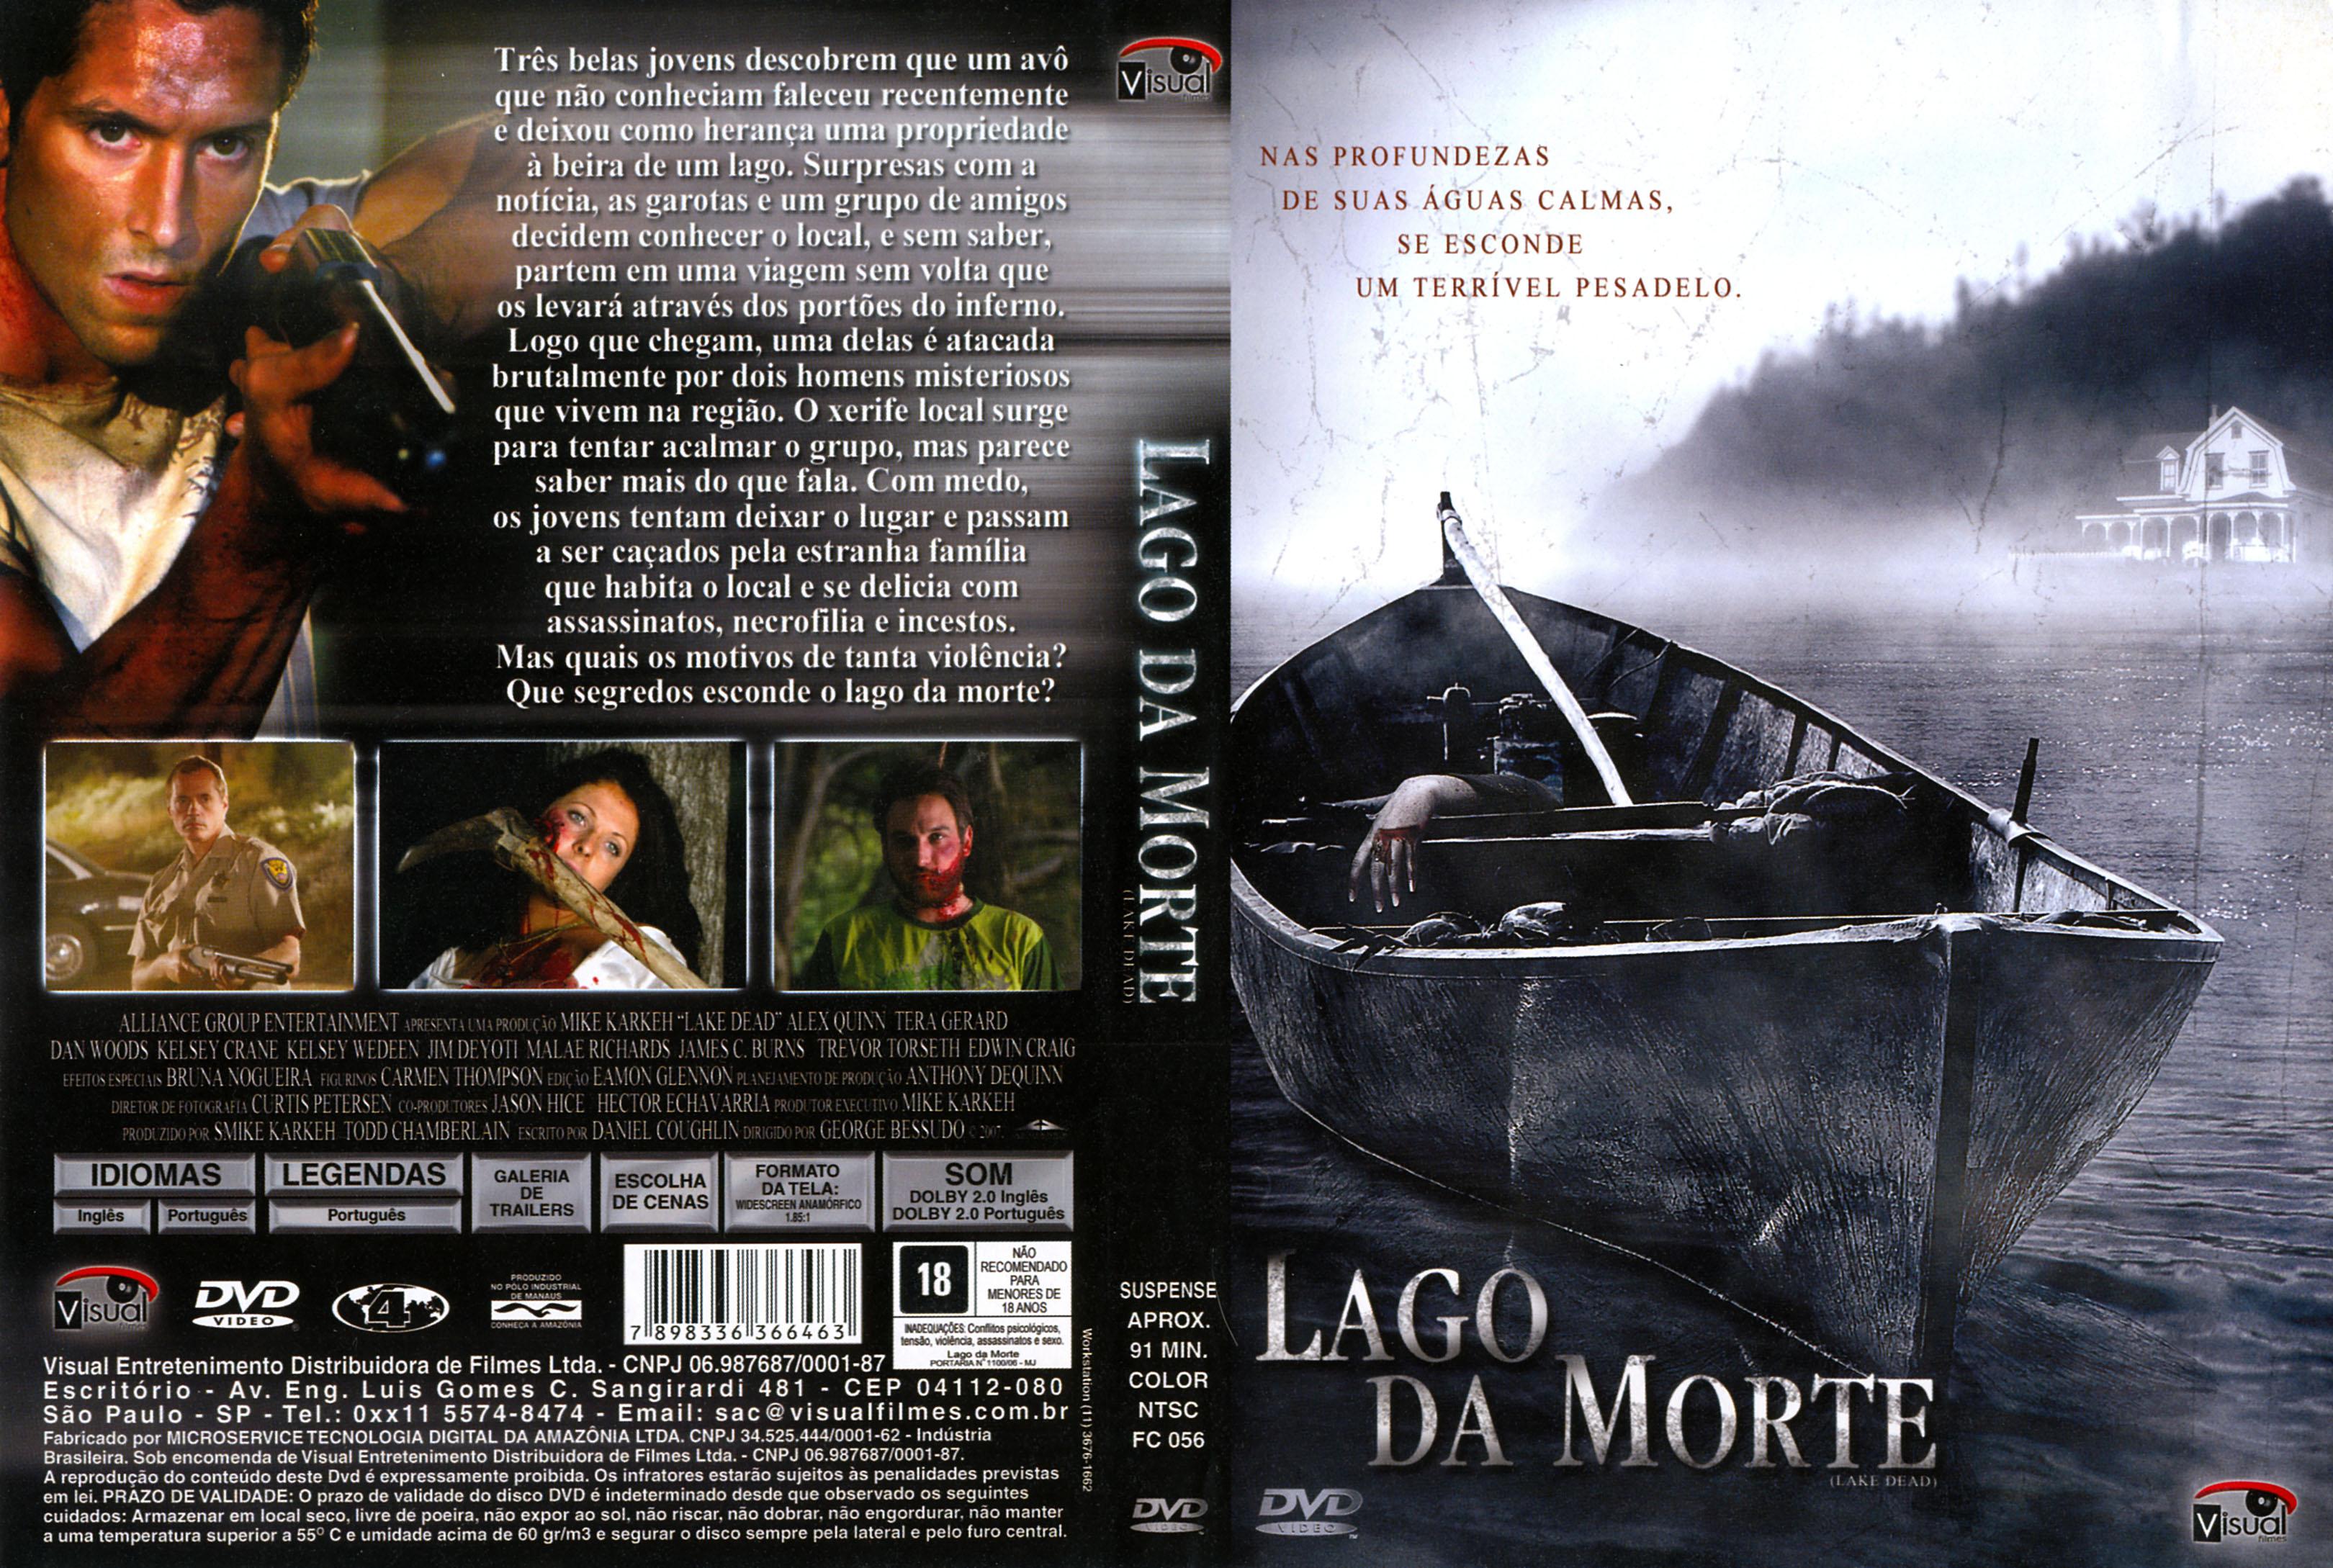 LagoDaMorte